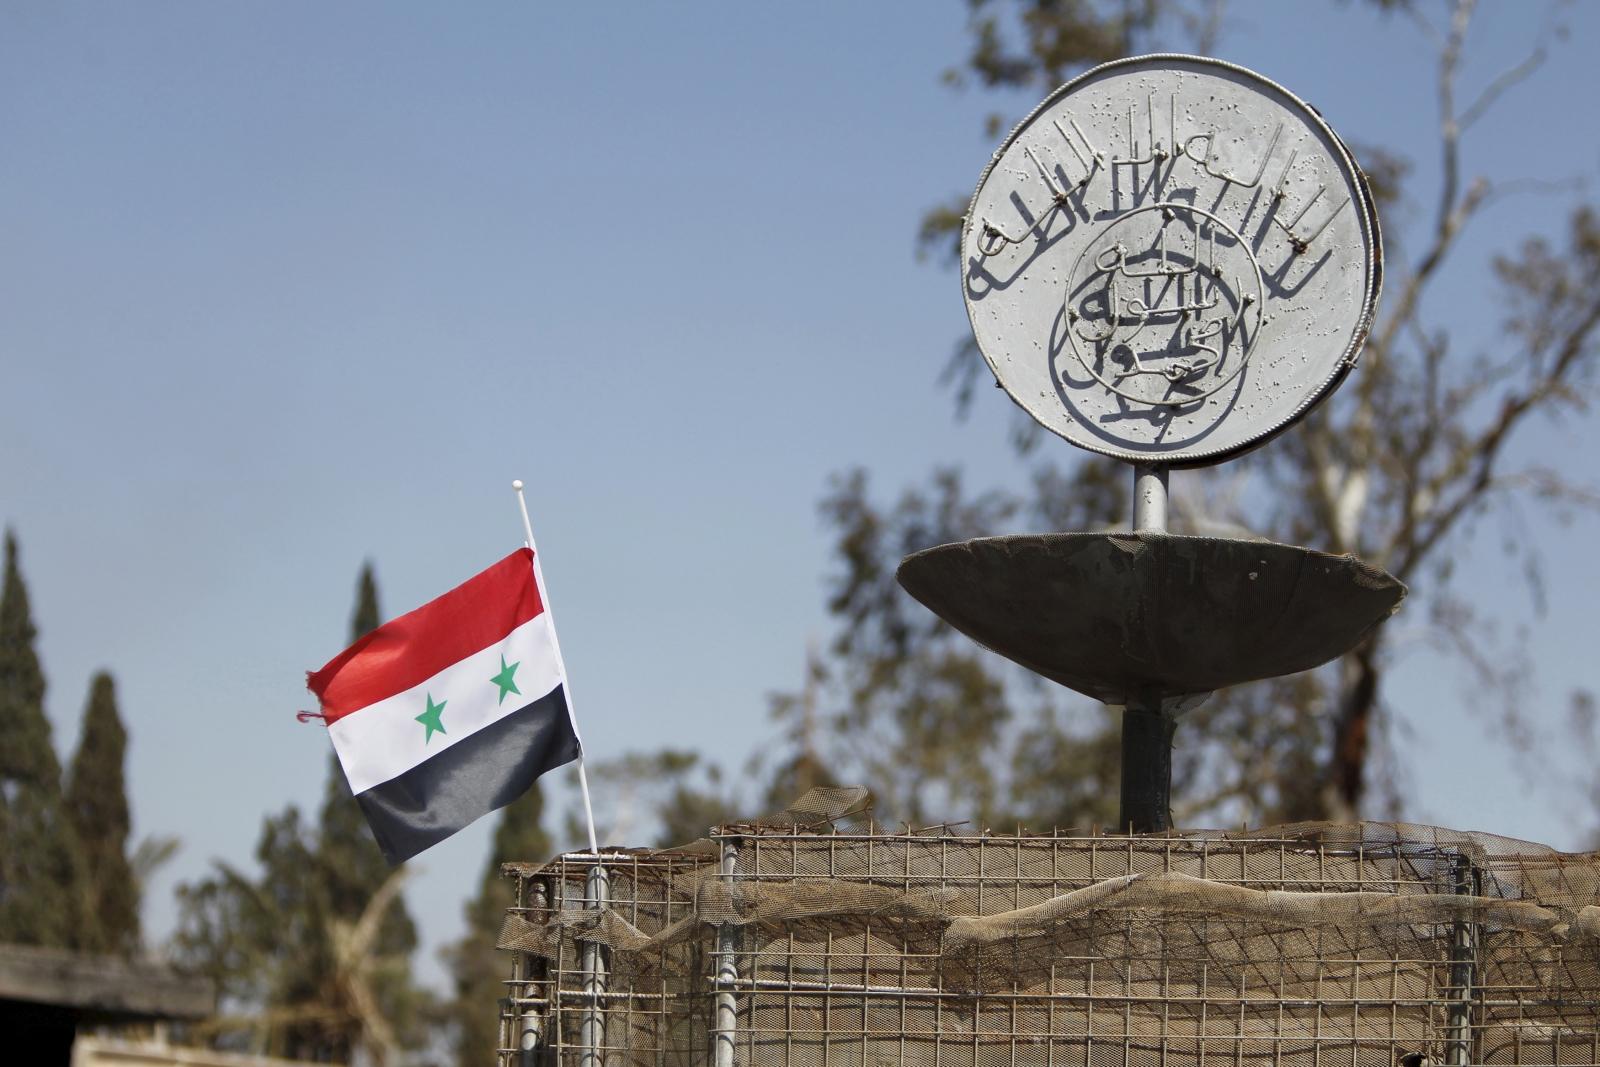 Syria flag near Isis slogan